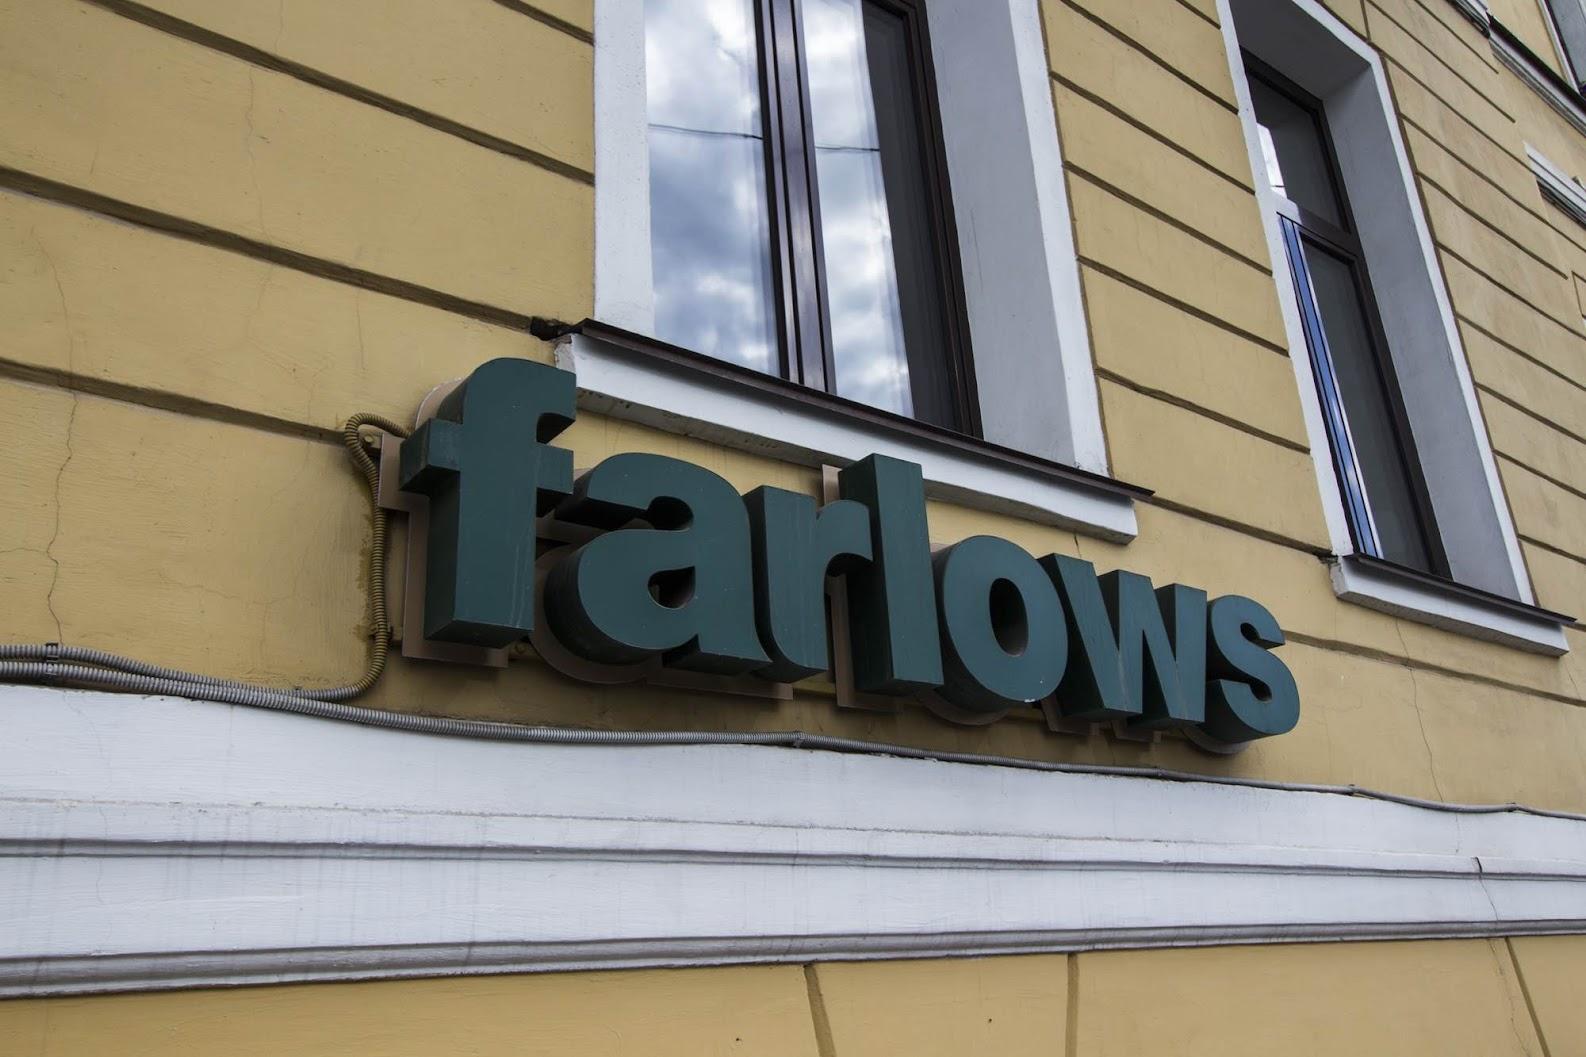 Farlows - Санкт Петербург